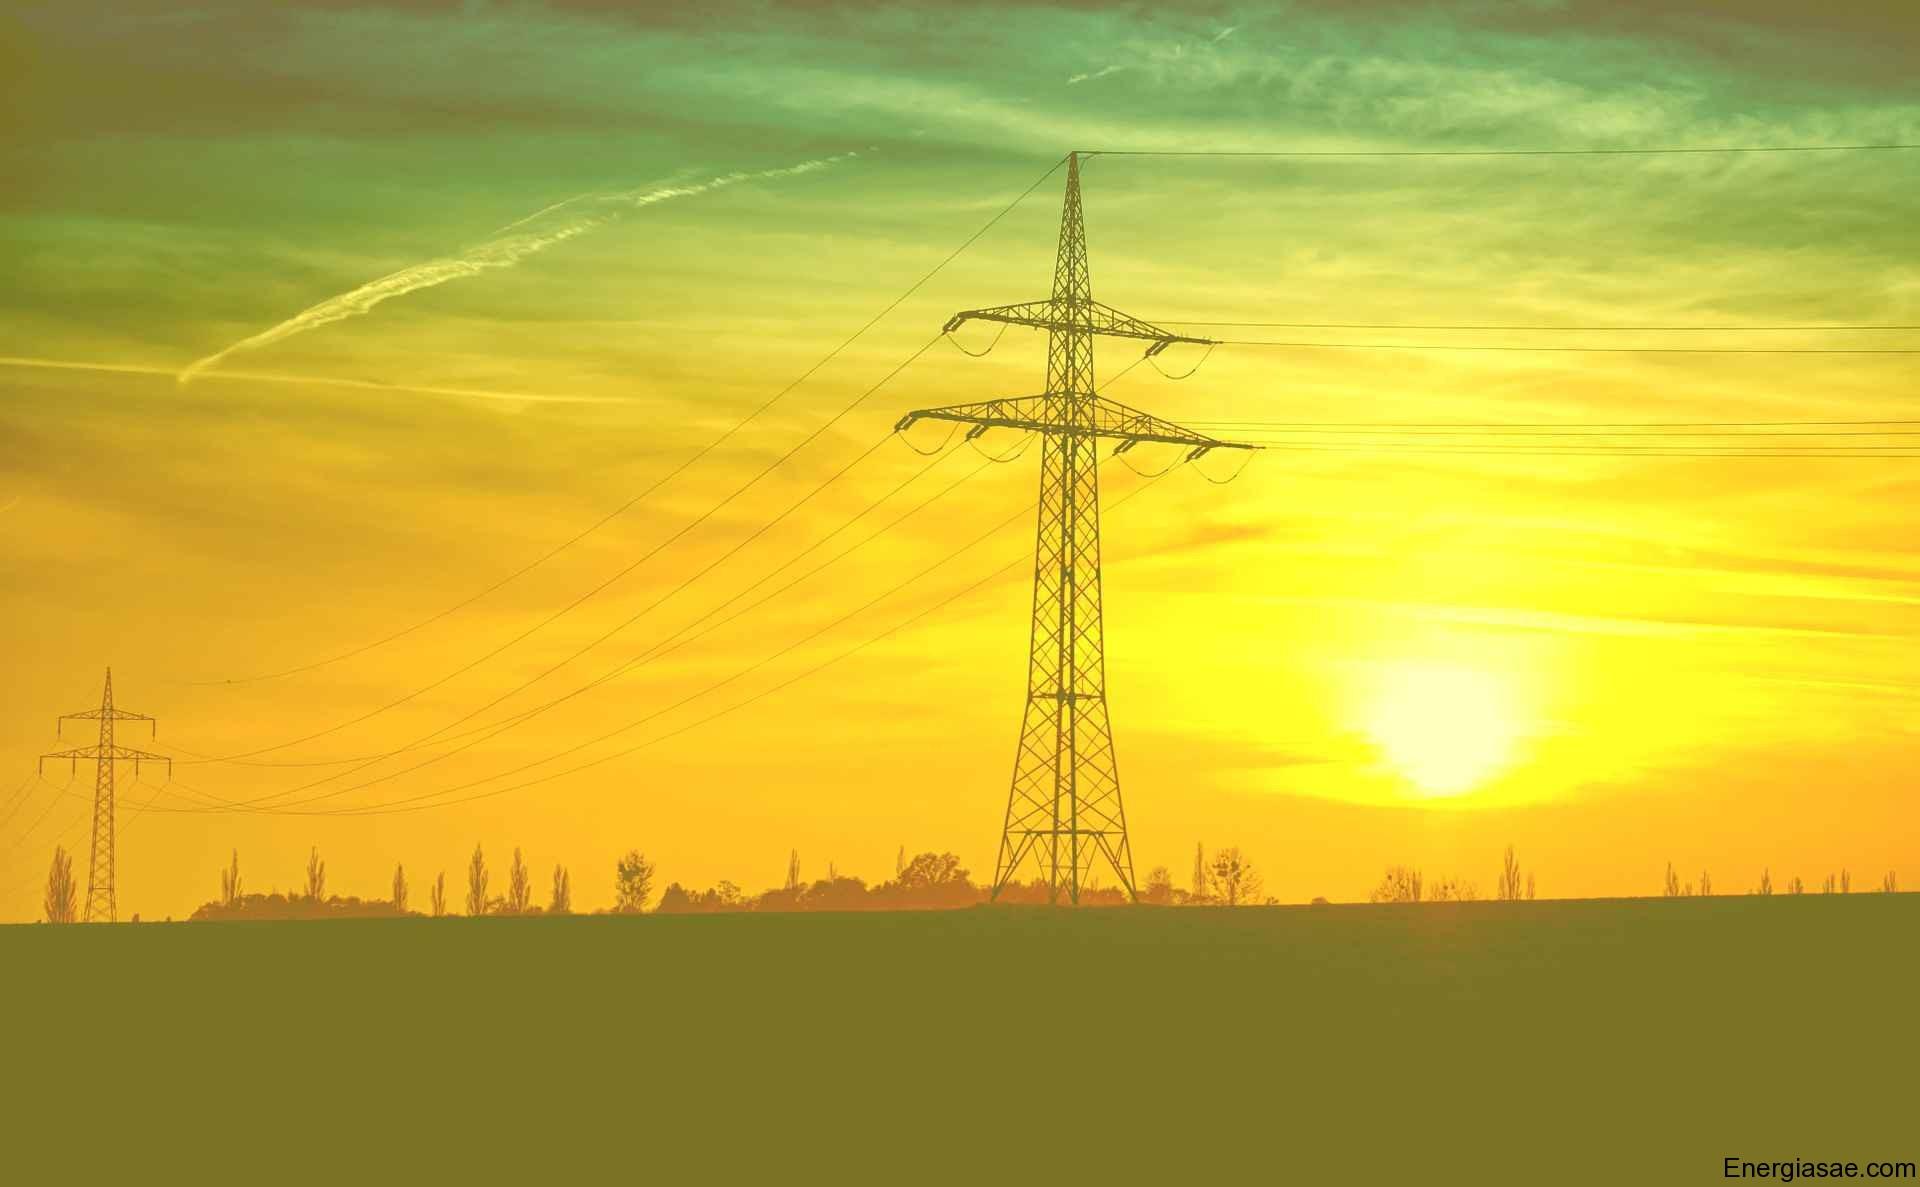 Imagenes de energia electrica